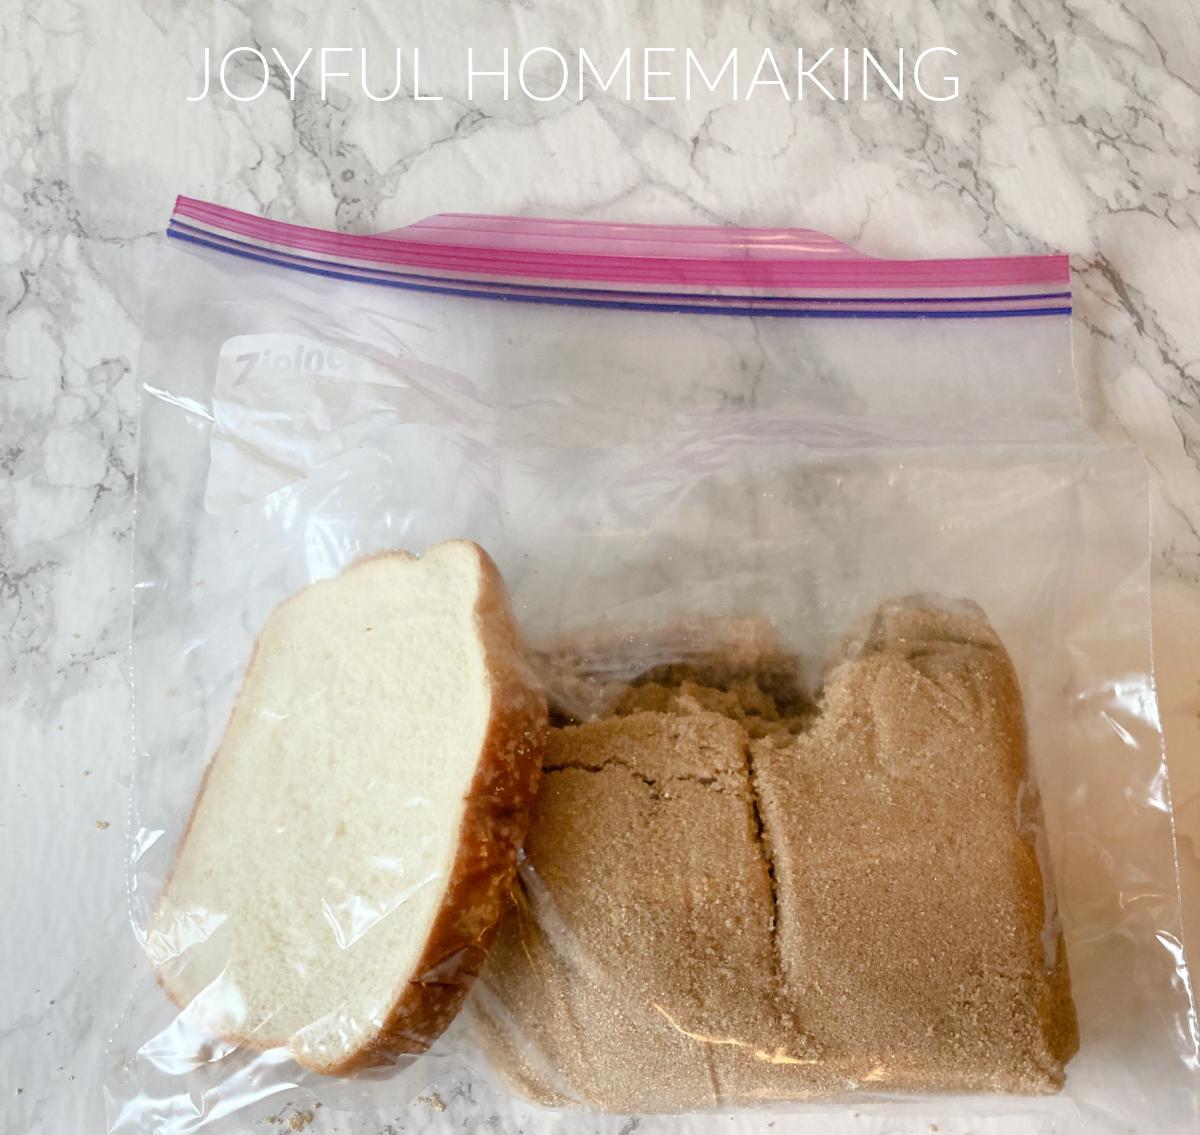 , How to Soften Brown Sugar, Joyful Homemaking